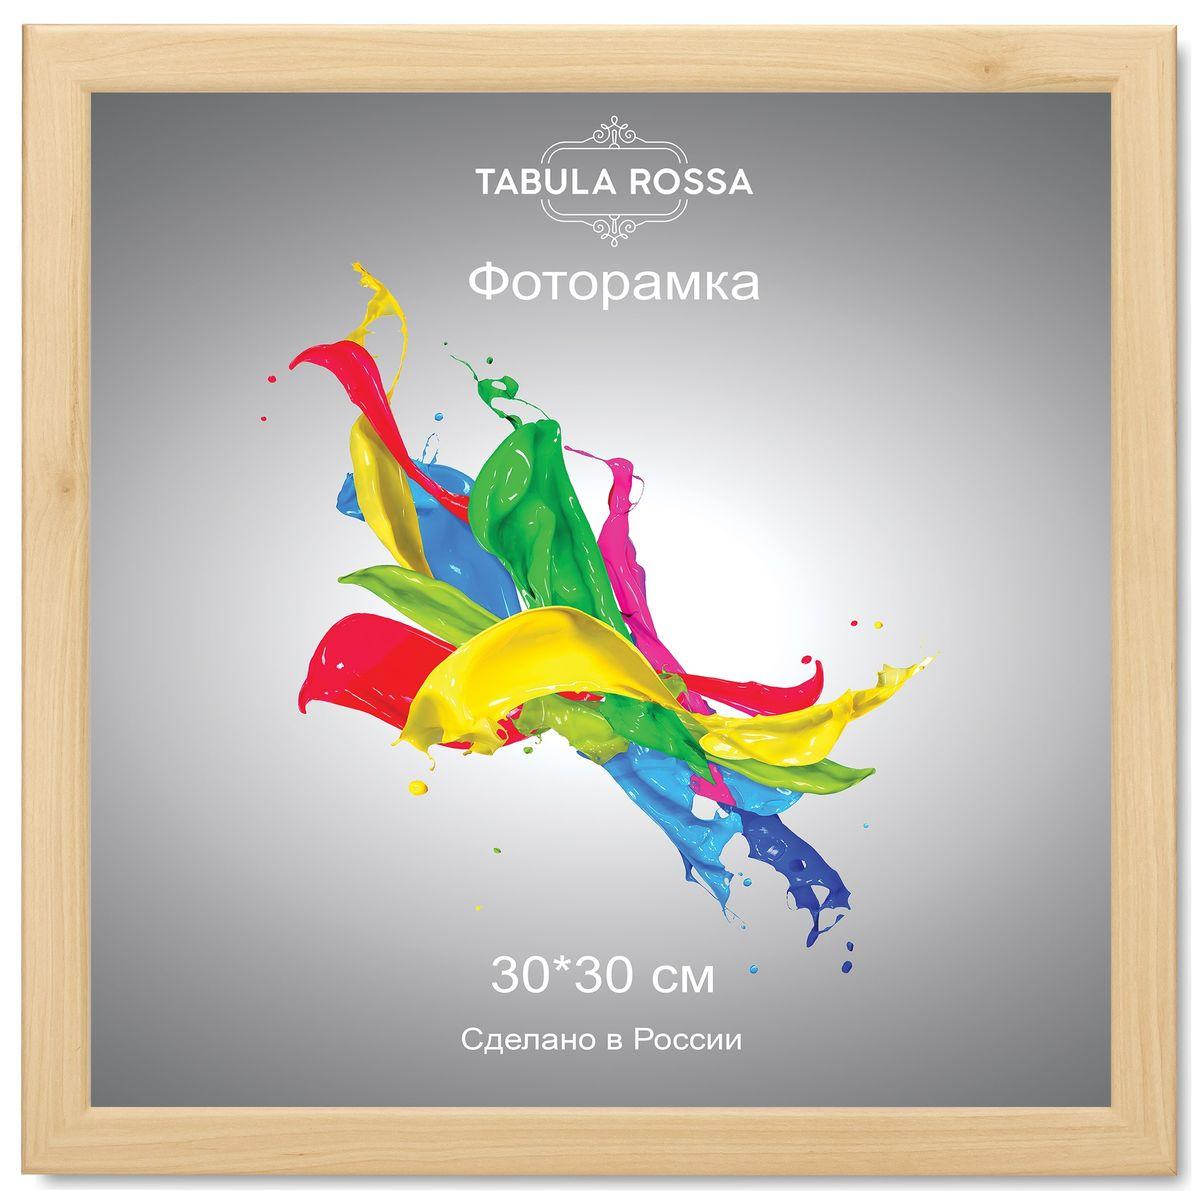 Фоторамка Tabula Rossa, цвет: клен, 30 х 30 см. ТР 6036 фоторамки tabula rossa фоторамка 13х18 455